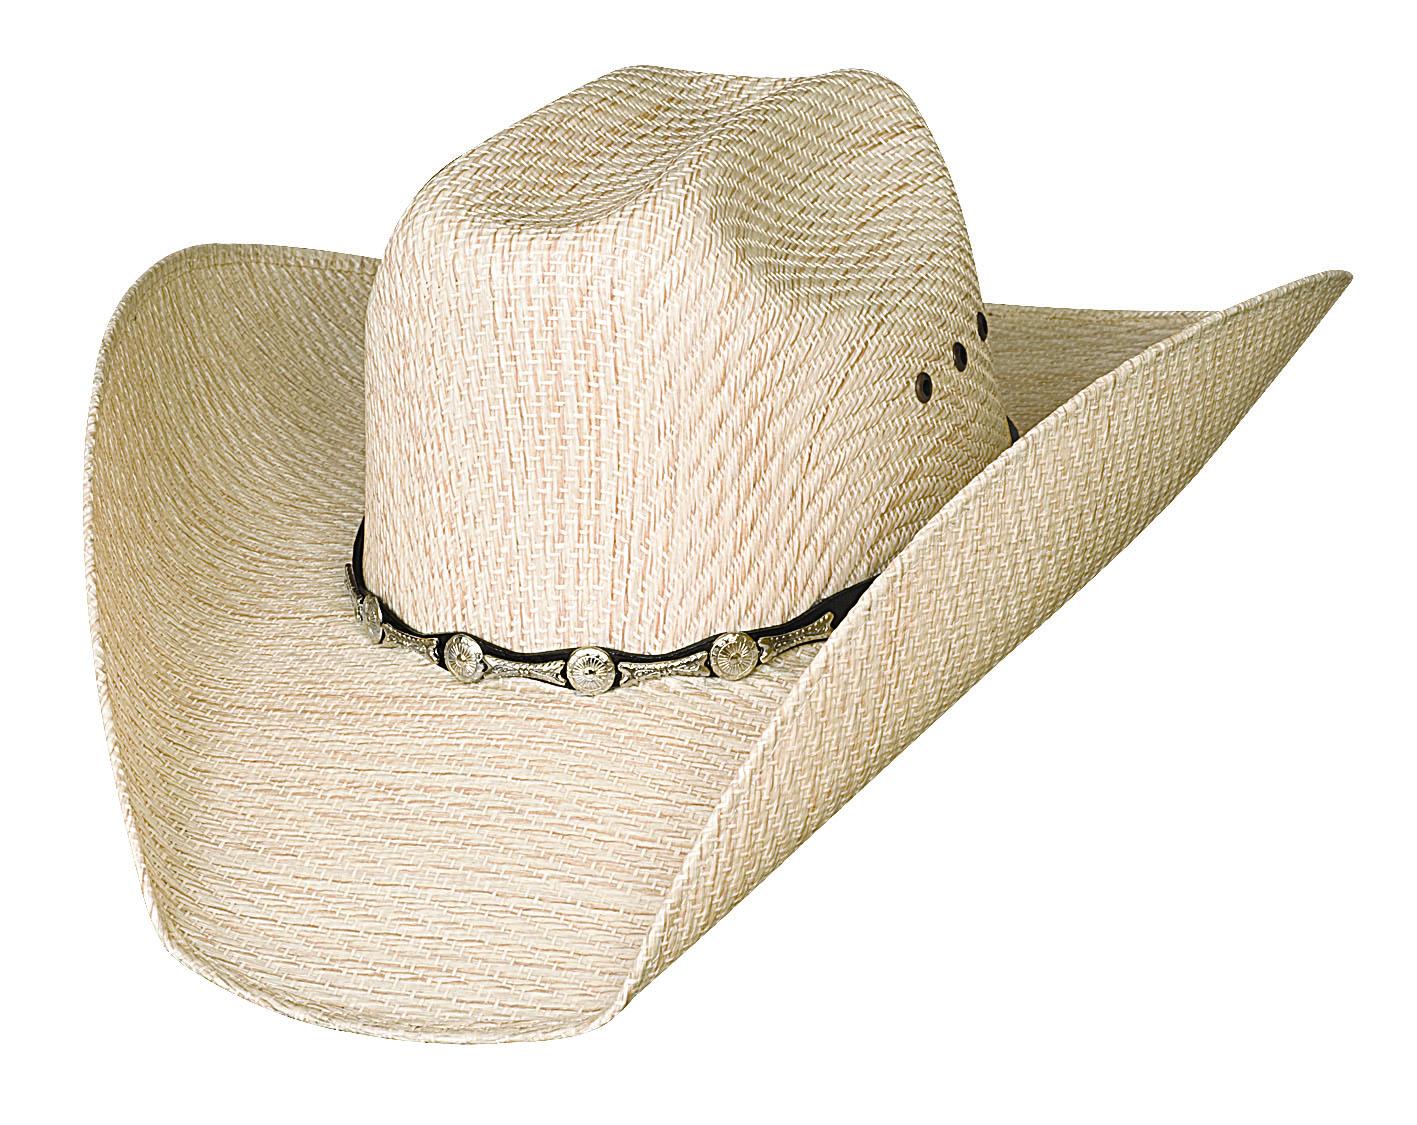 New Bullhide Hats Backwoods Western 50X Tuff Straw Cowboy Hat  27094e5fcbf5